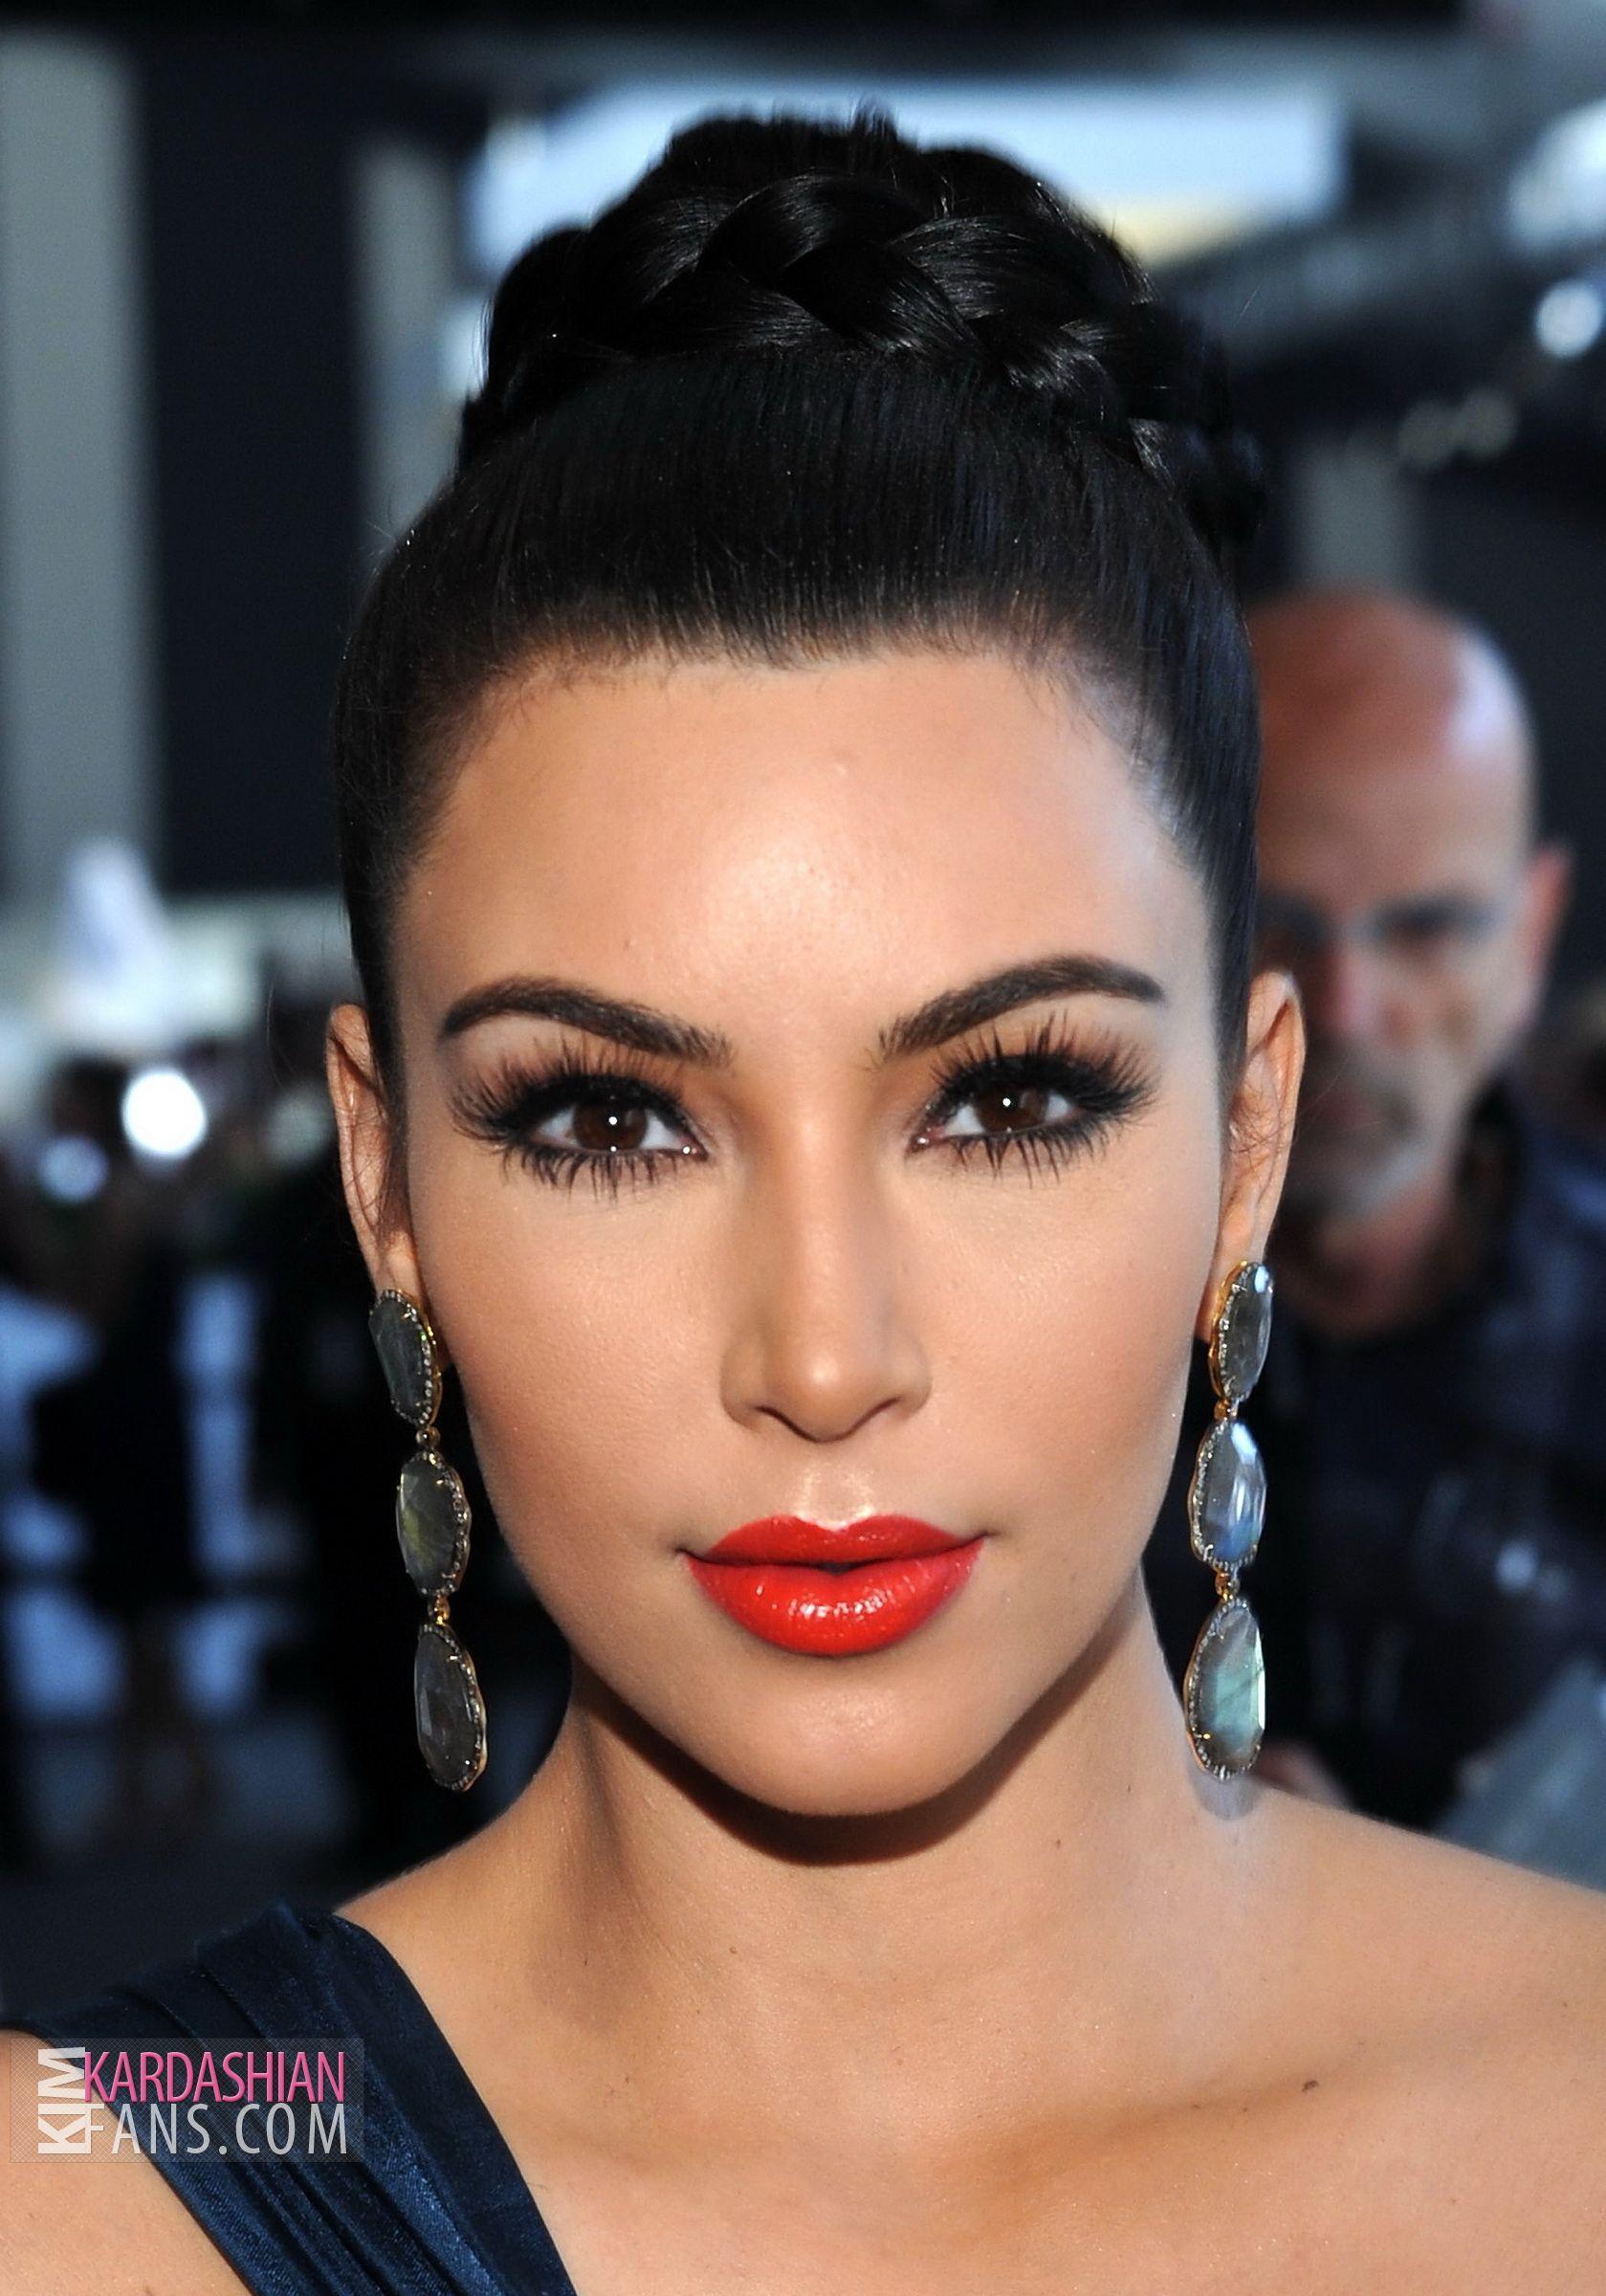 Red Lips Makeup Kim Kardashian Looks